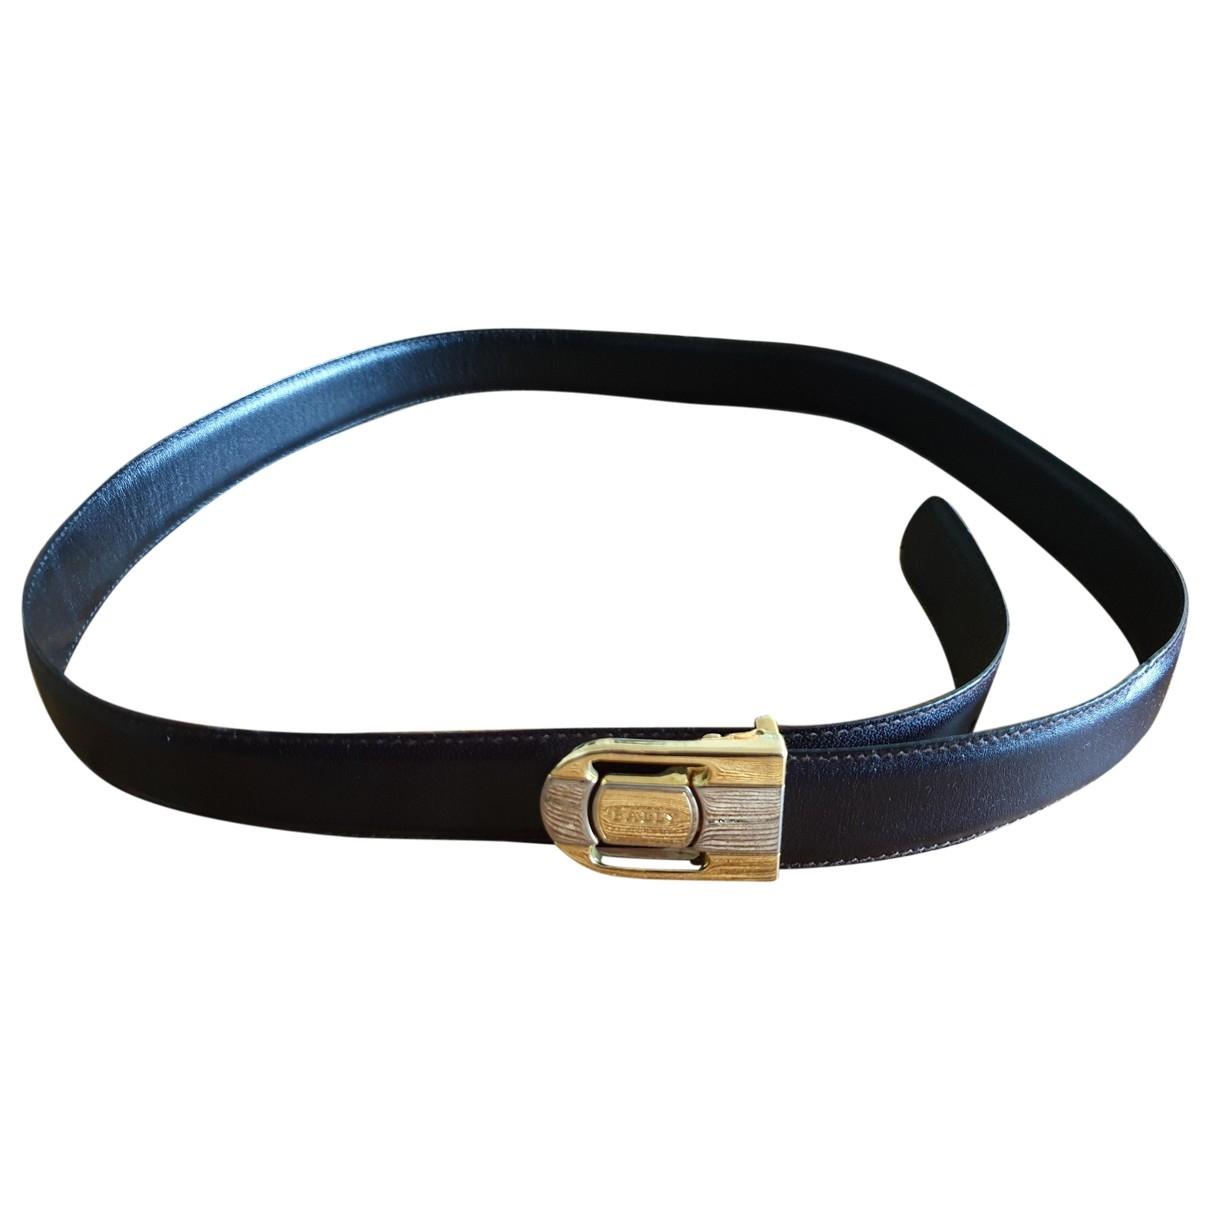 Bally \N Brown Leather belt for Men M international